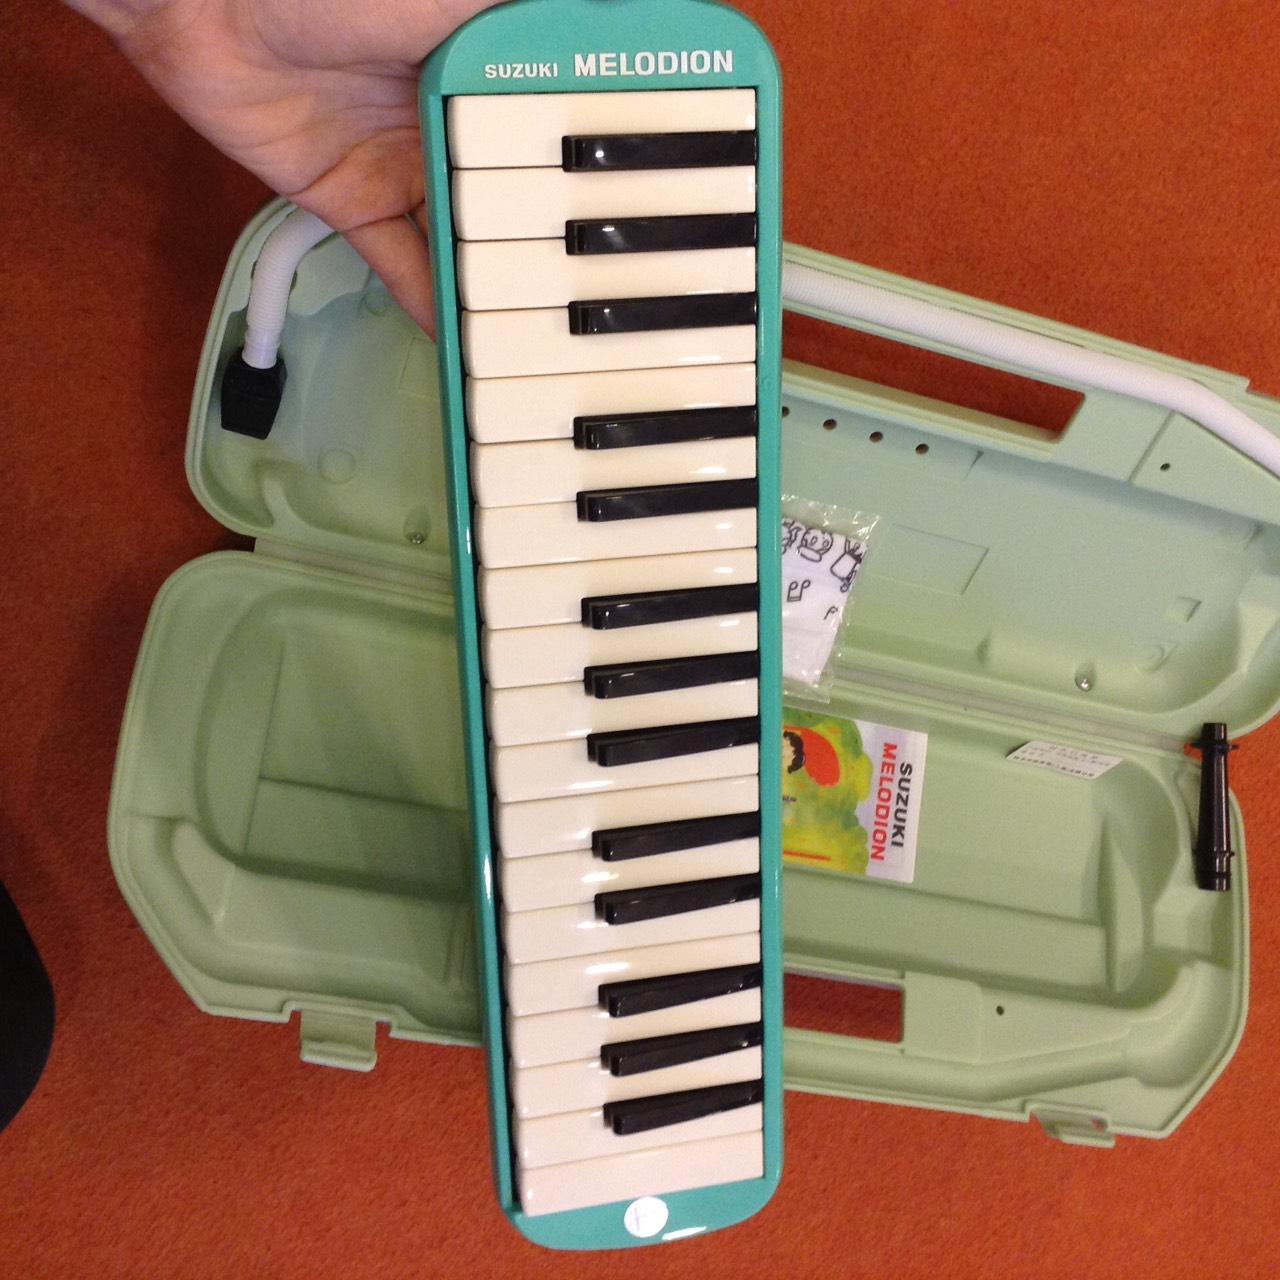 Kèn Suzuki Melodion  32 Phím MX-32D (Melodica - Pianica)